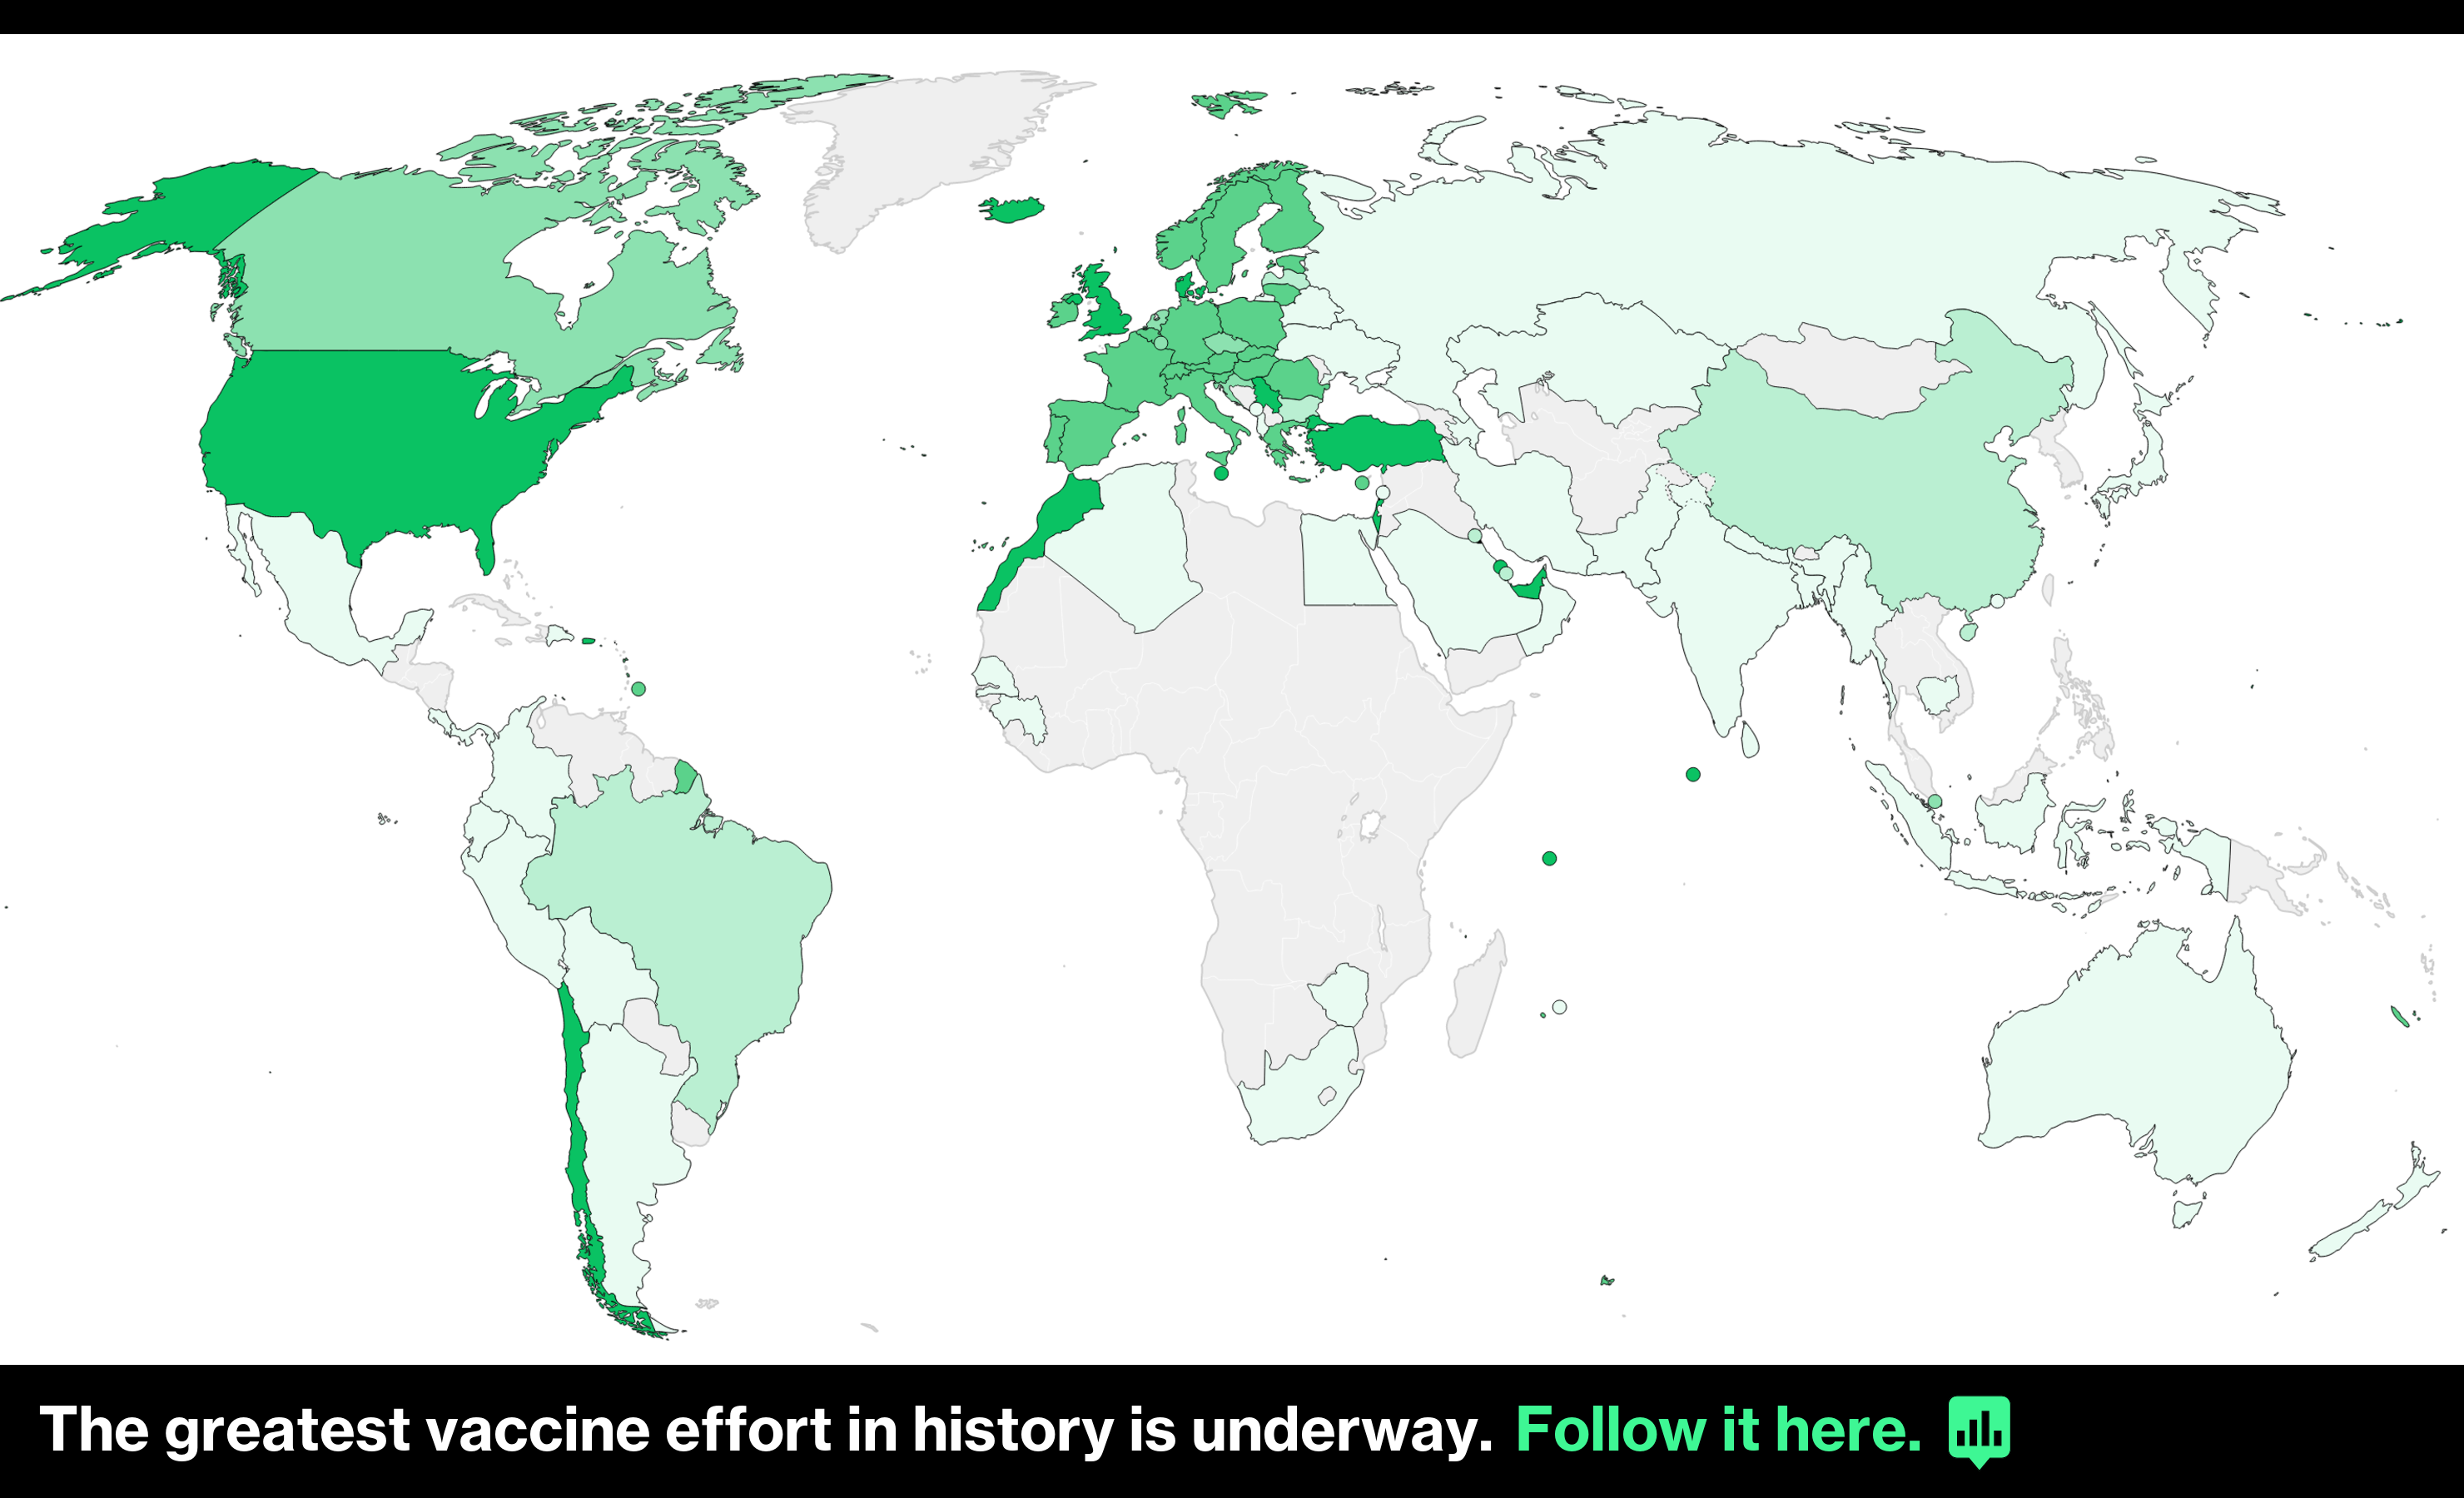 Covid vacina-rastreada-distribuição-global-vacina-incorporada